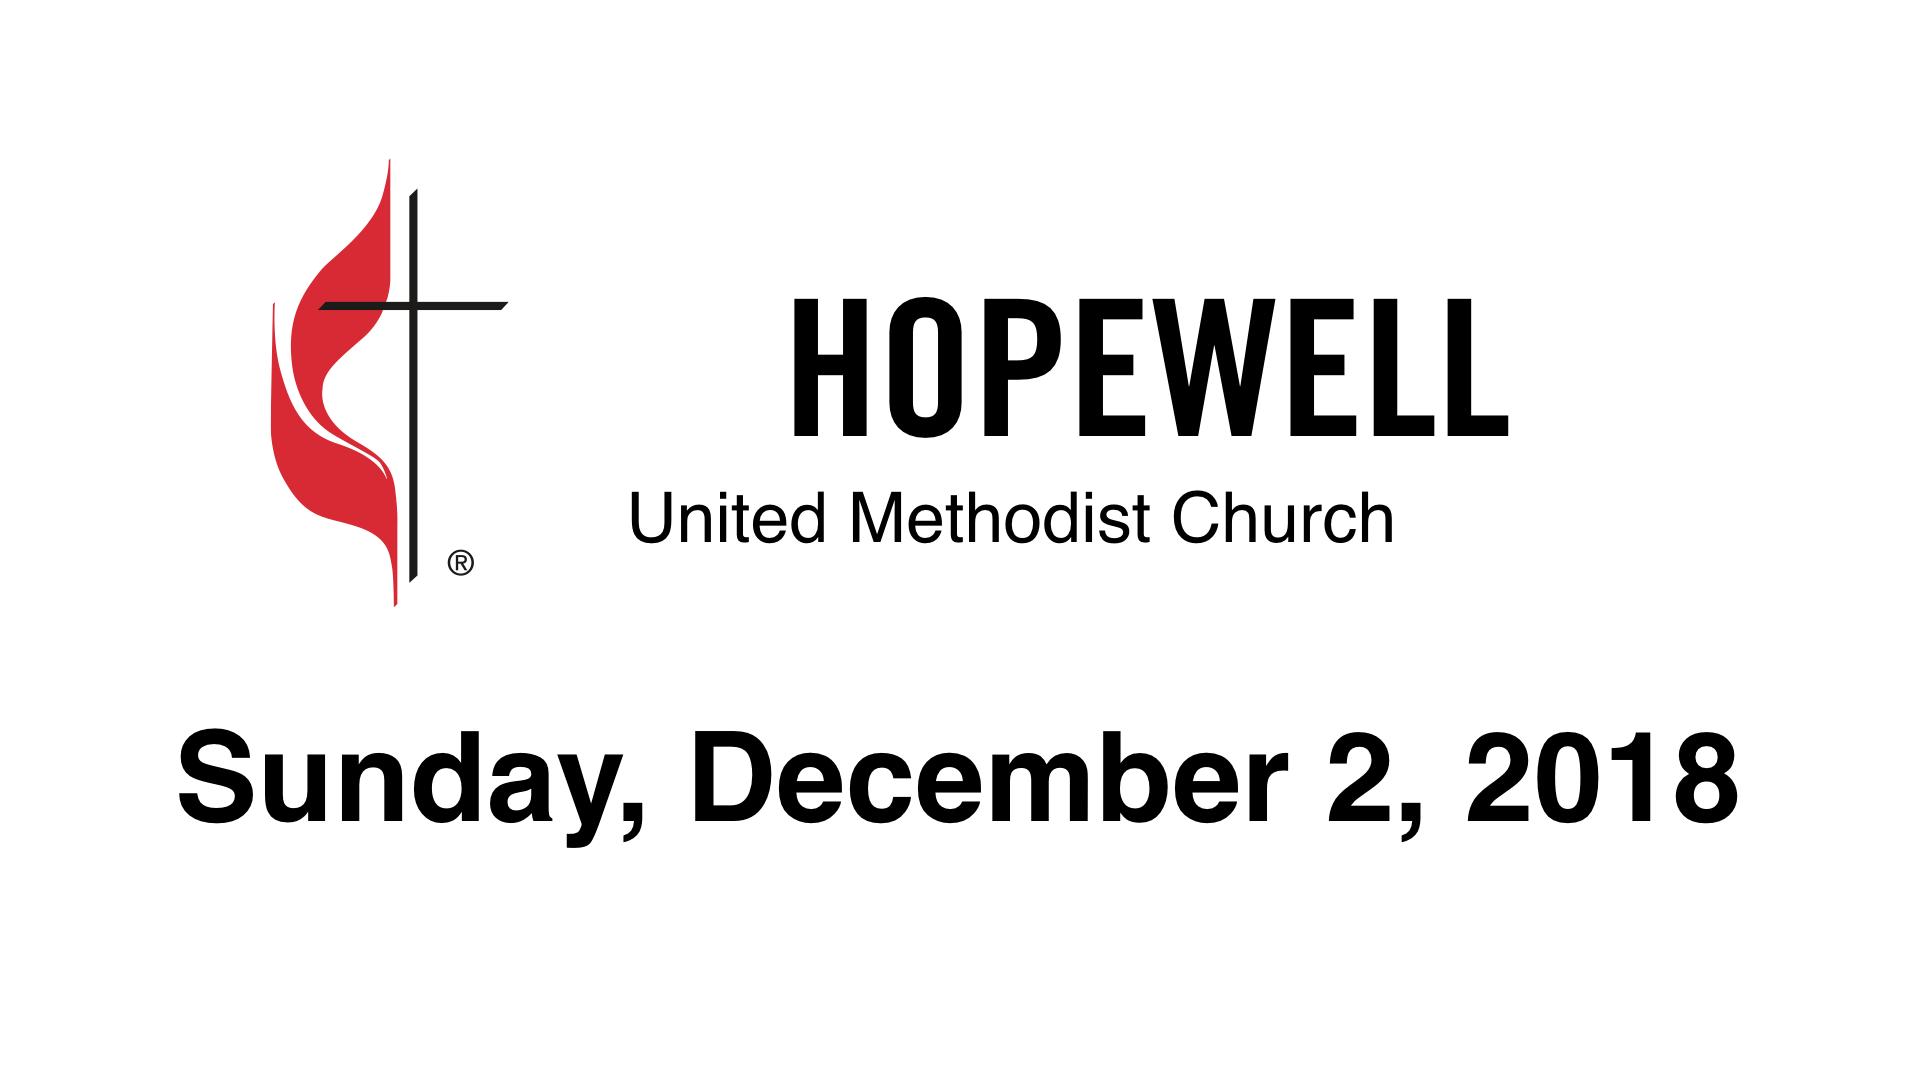 December 02, 2018 – Hopewell UMC